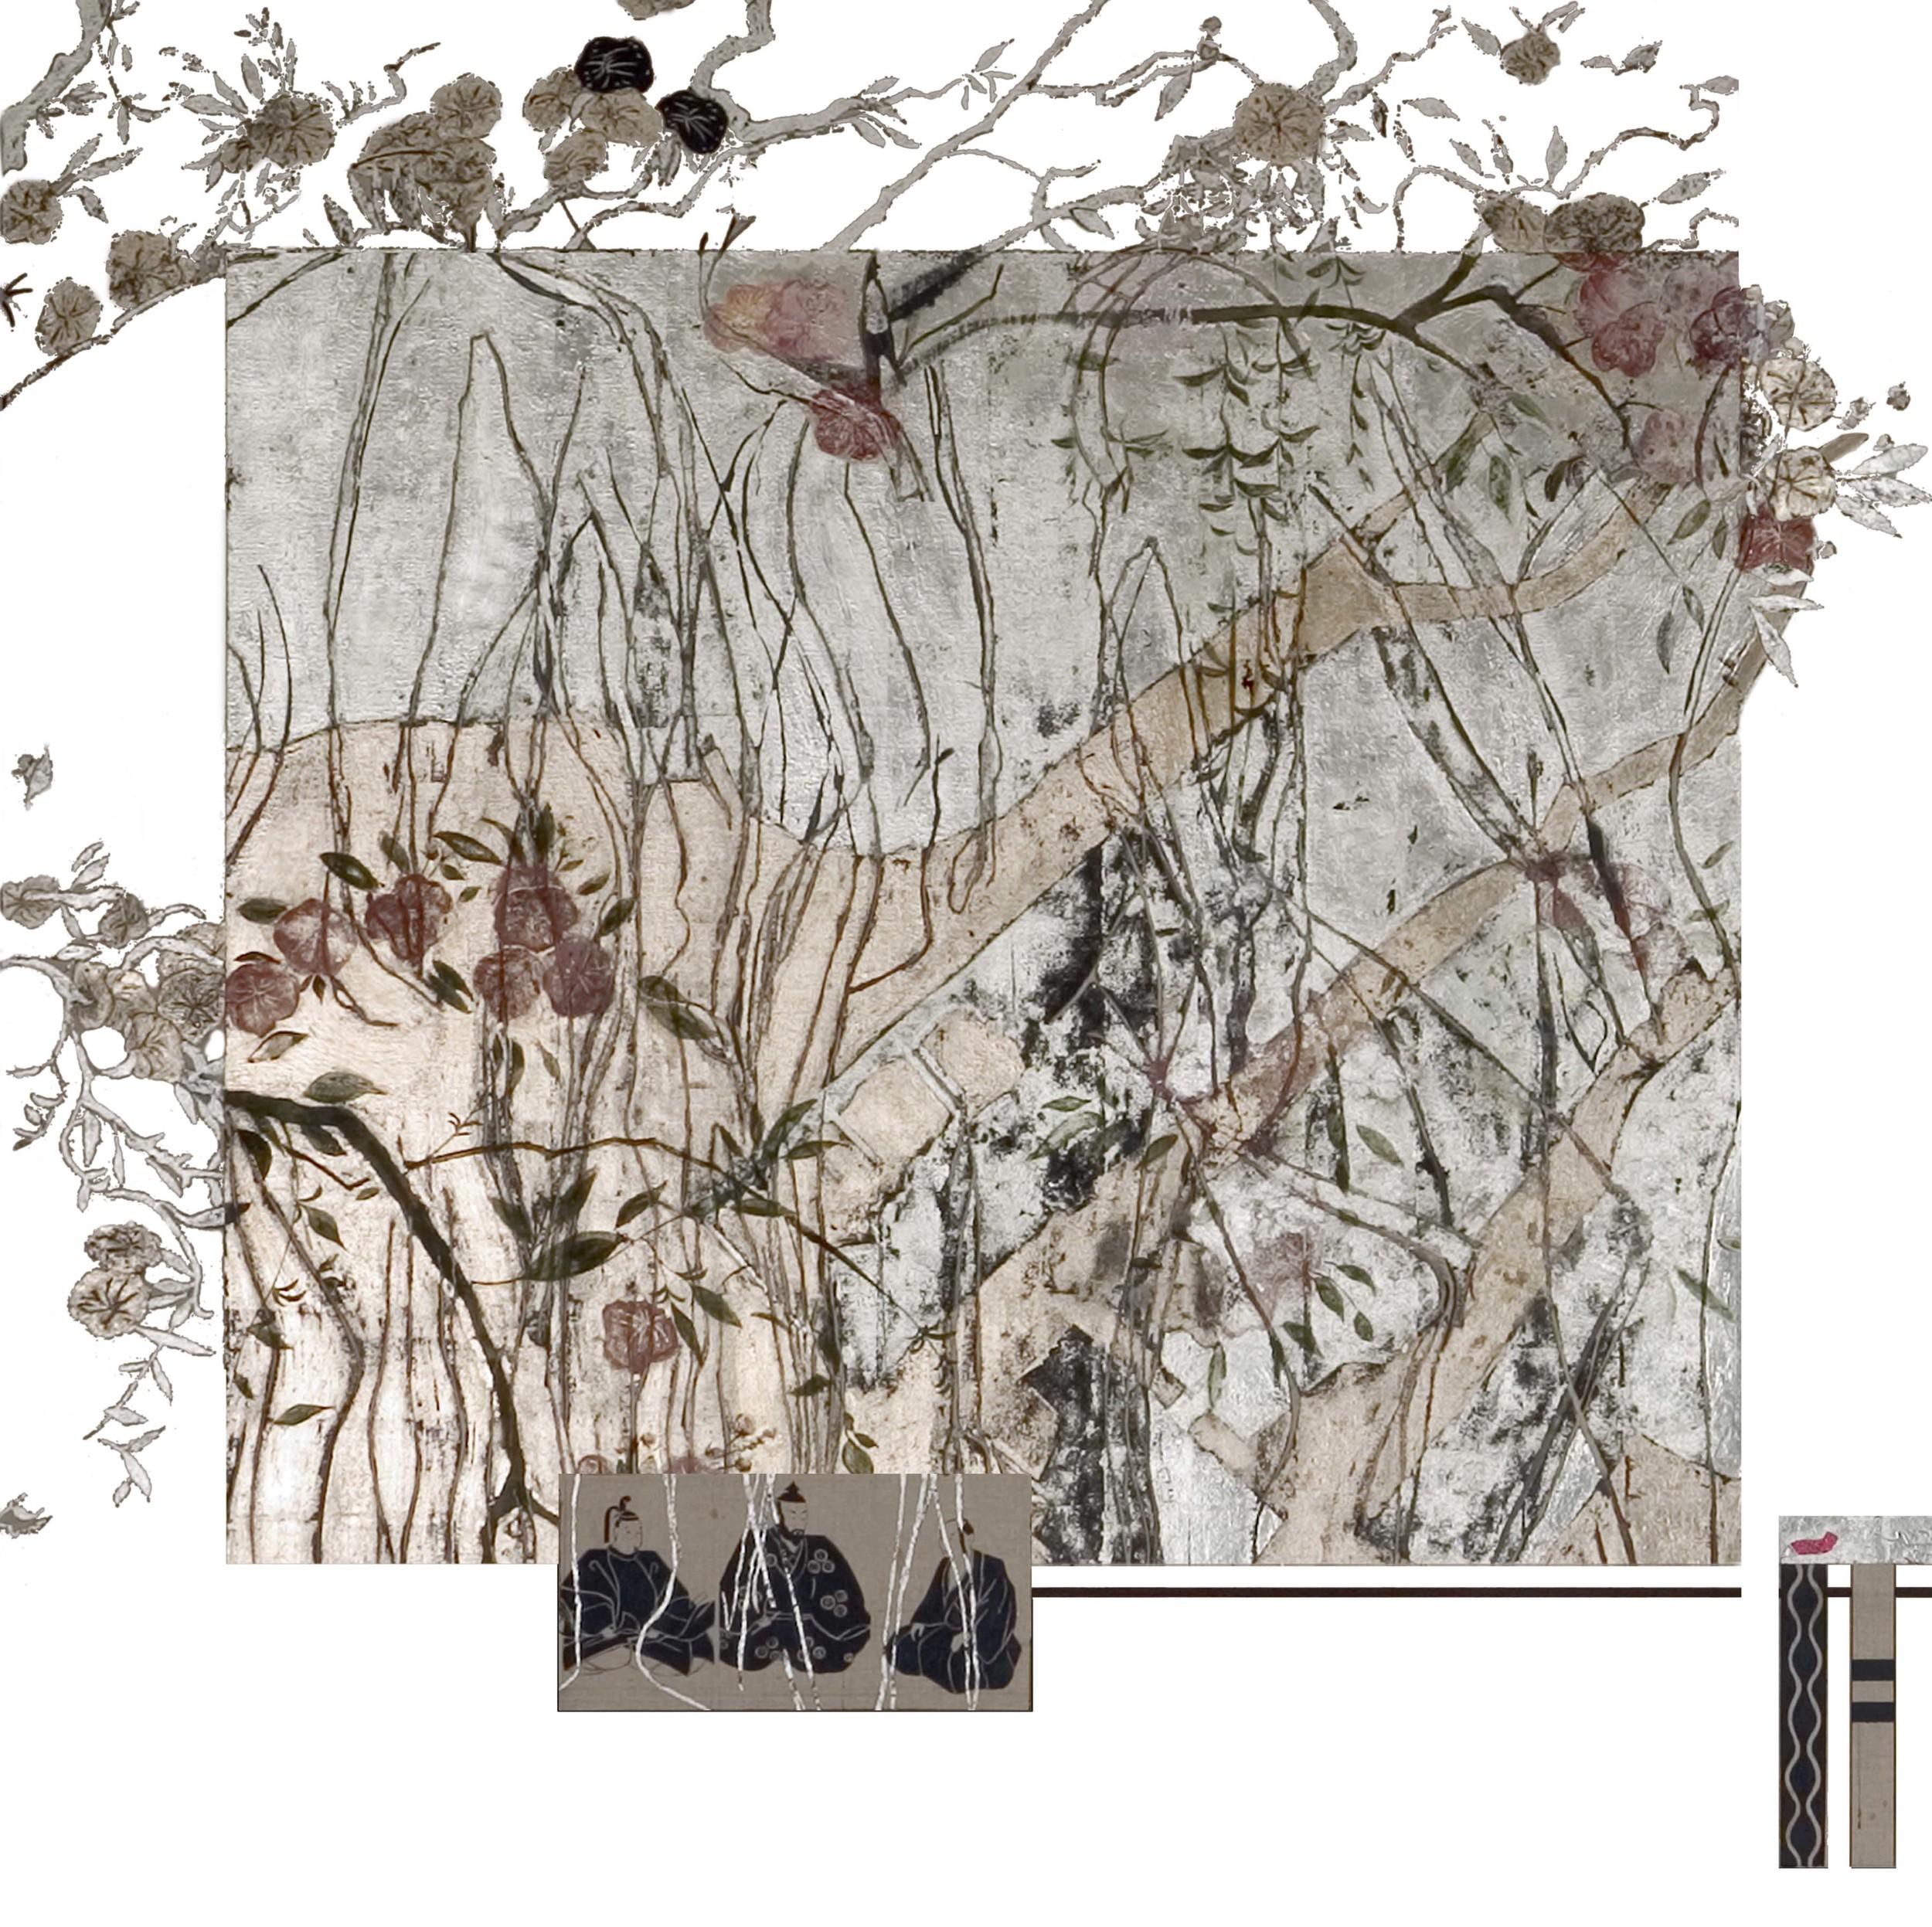 Hiroshima12x12FinalFlat Crop.jpg